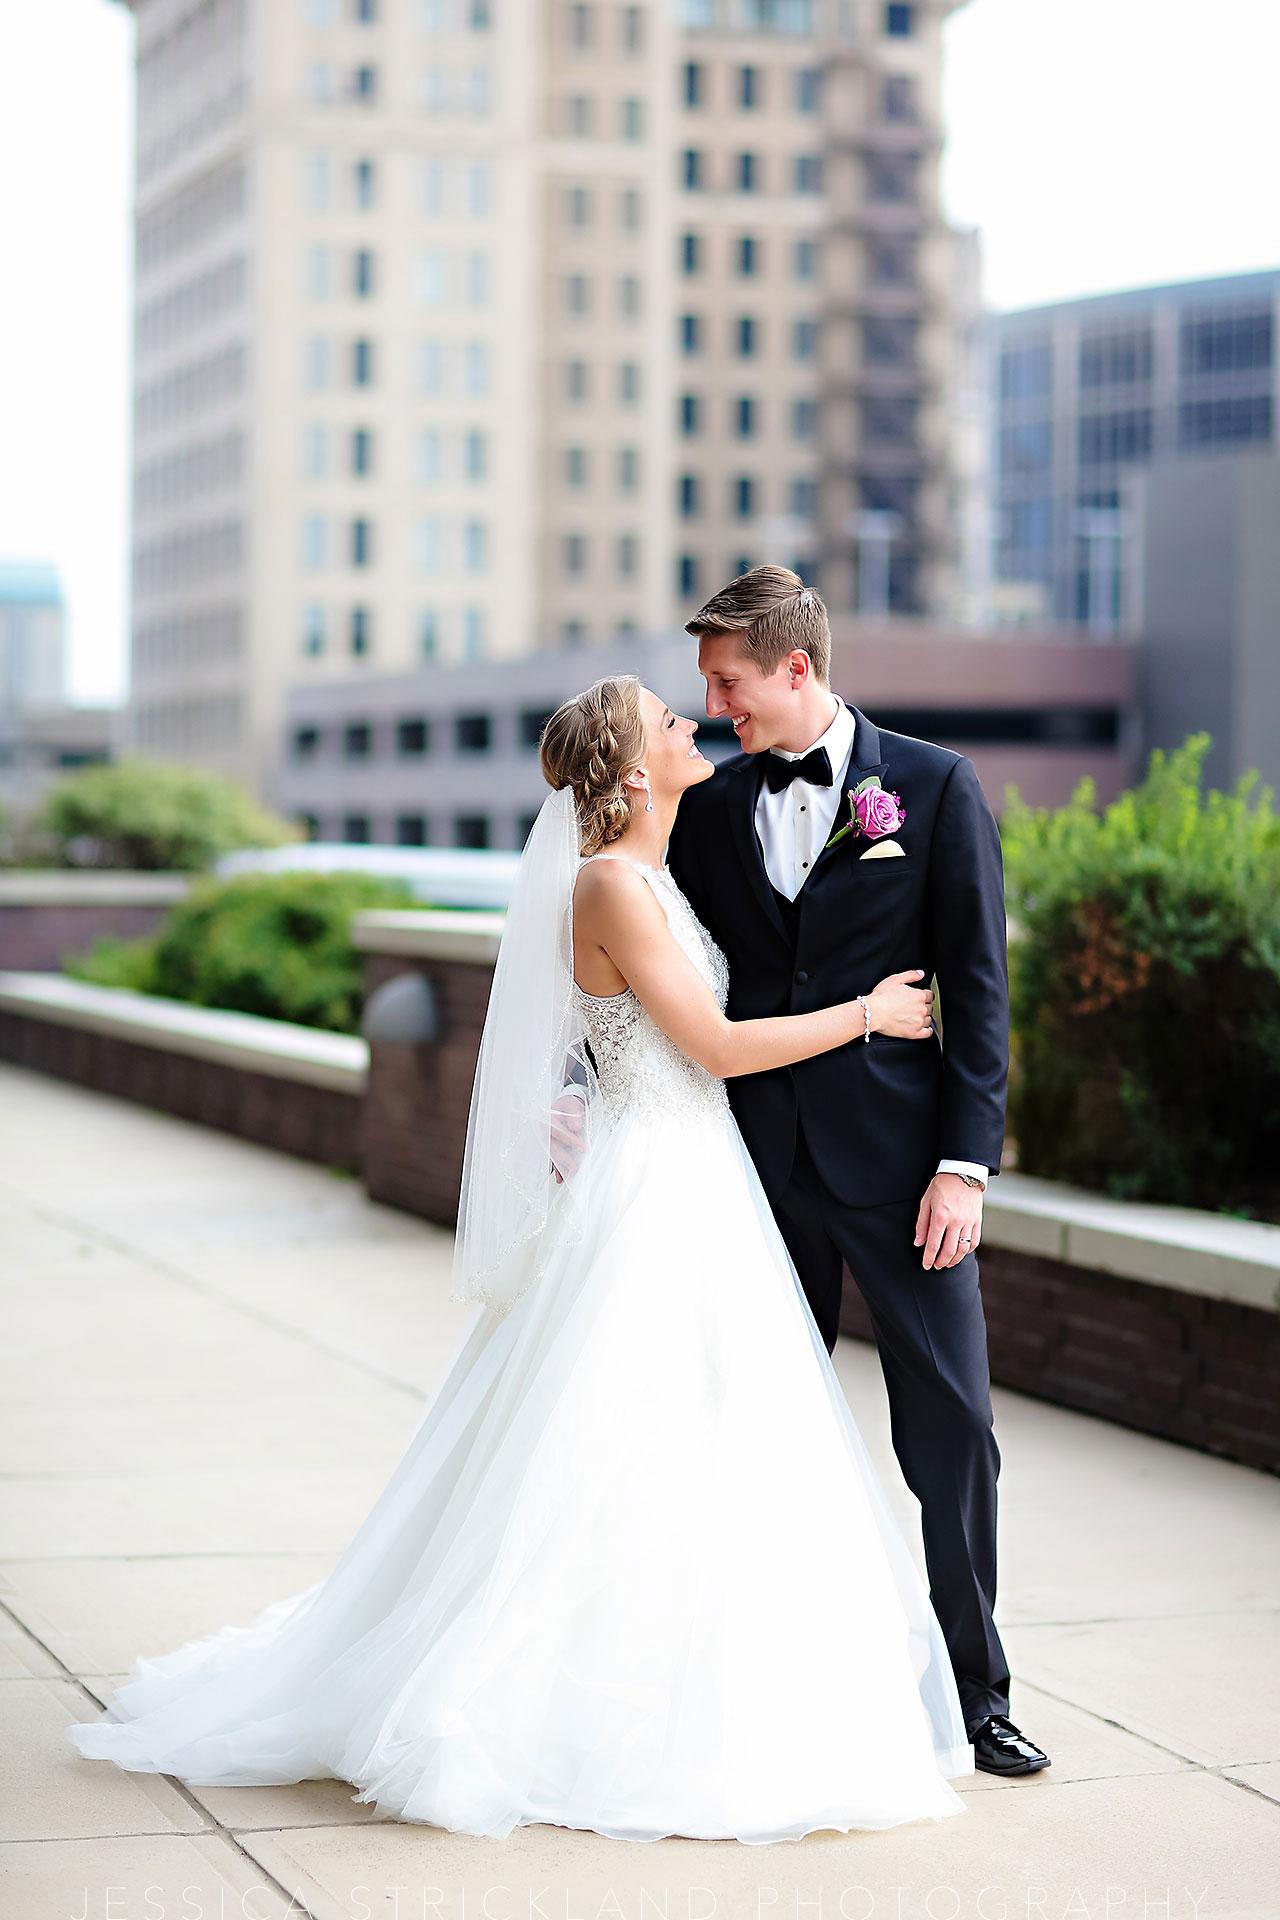 Serra Alex Regions Tower Indianapolis Wedding 268 watermarked